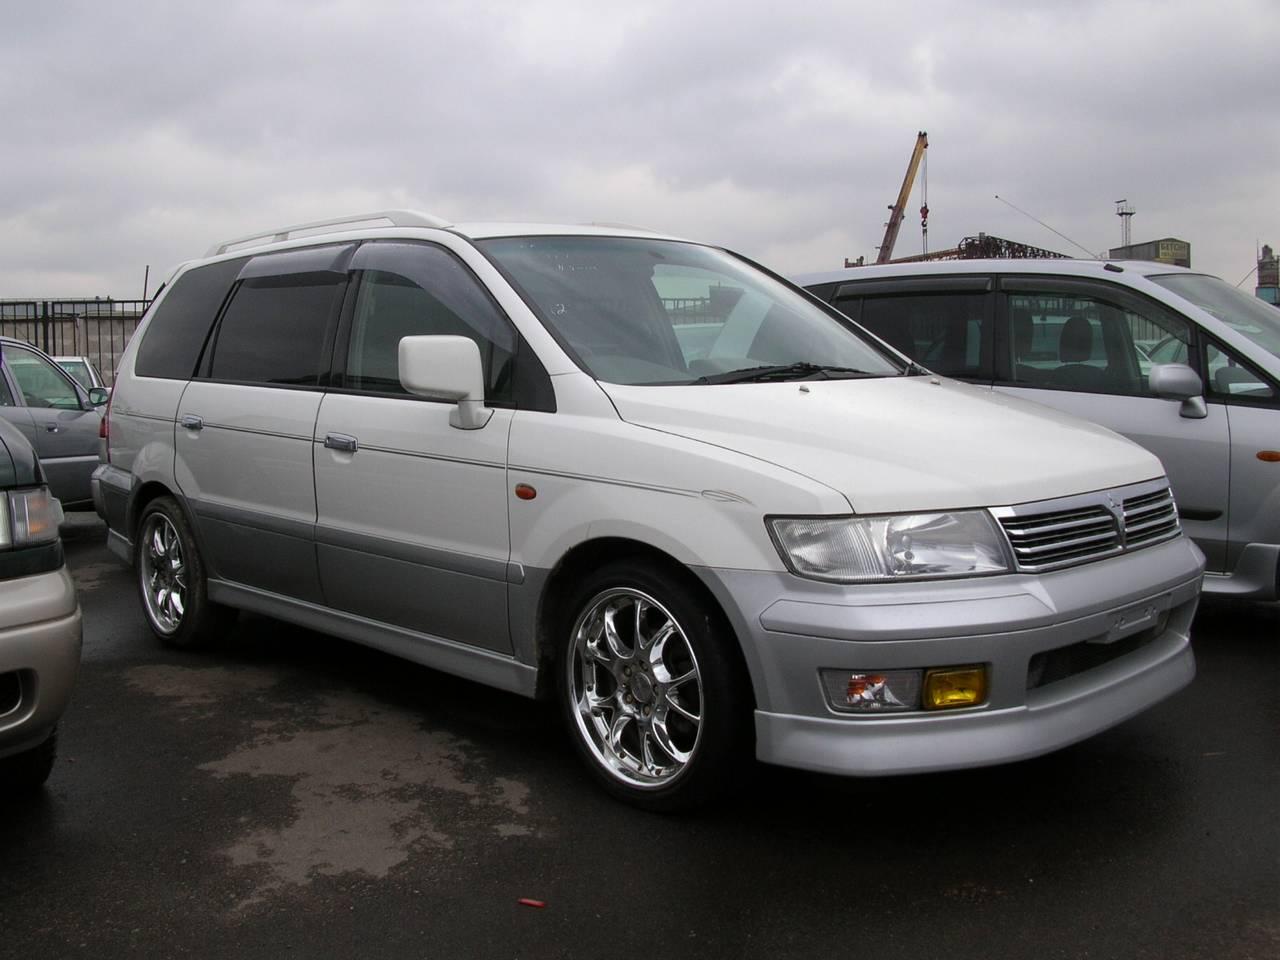 automotive database mitsubishi chariot rh autocarbase com Mitsubishi Chariot Grandis Modifide 1998 Mitsubishi Chariot Grandis